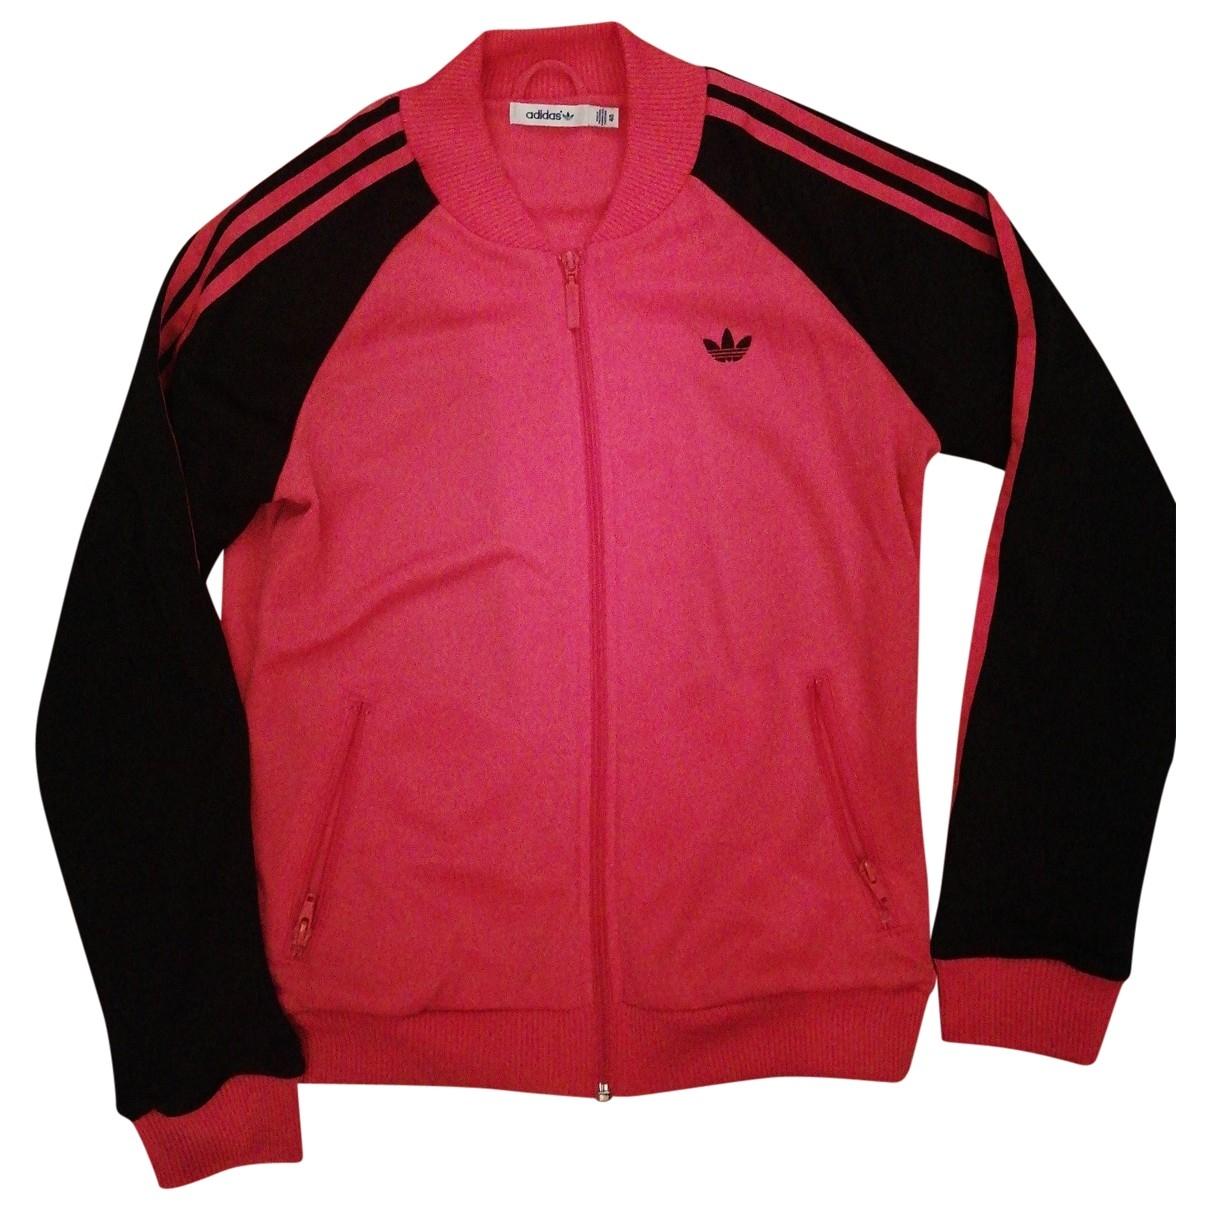 Adidas \N Jacke in  Rosa Polyester